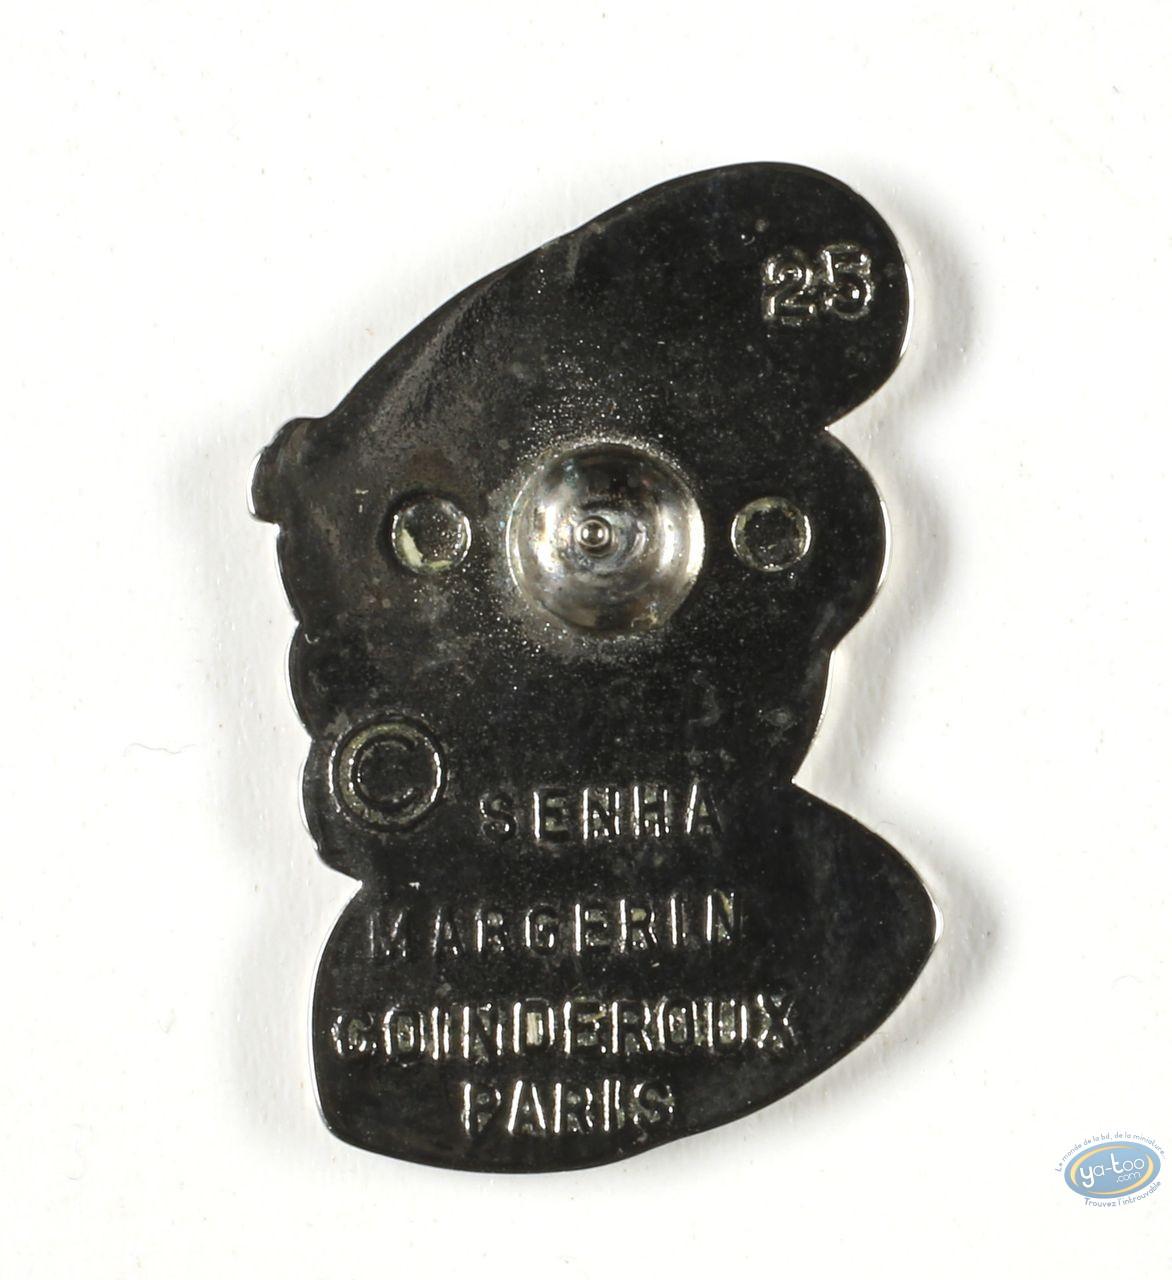 Pin's, Lucien : Metal Pins, Margerin, Lucien